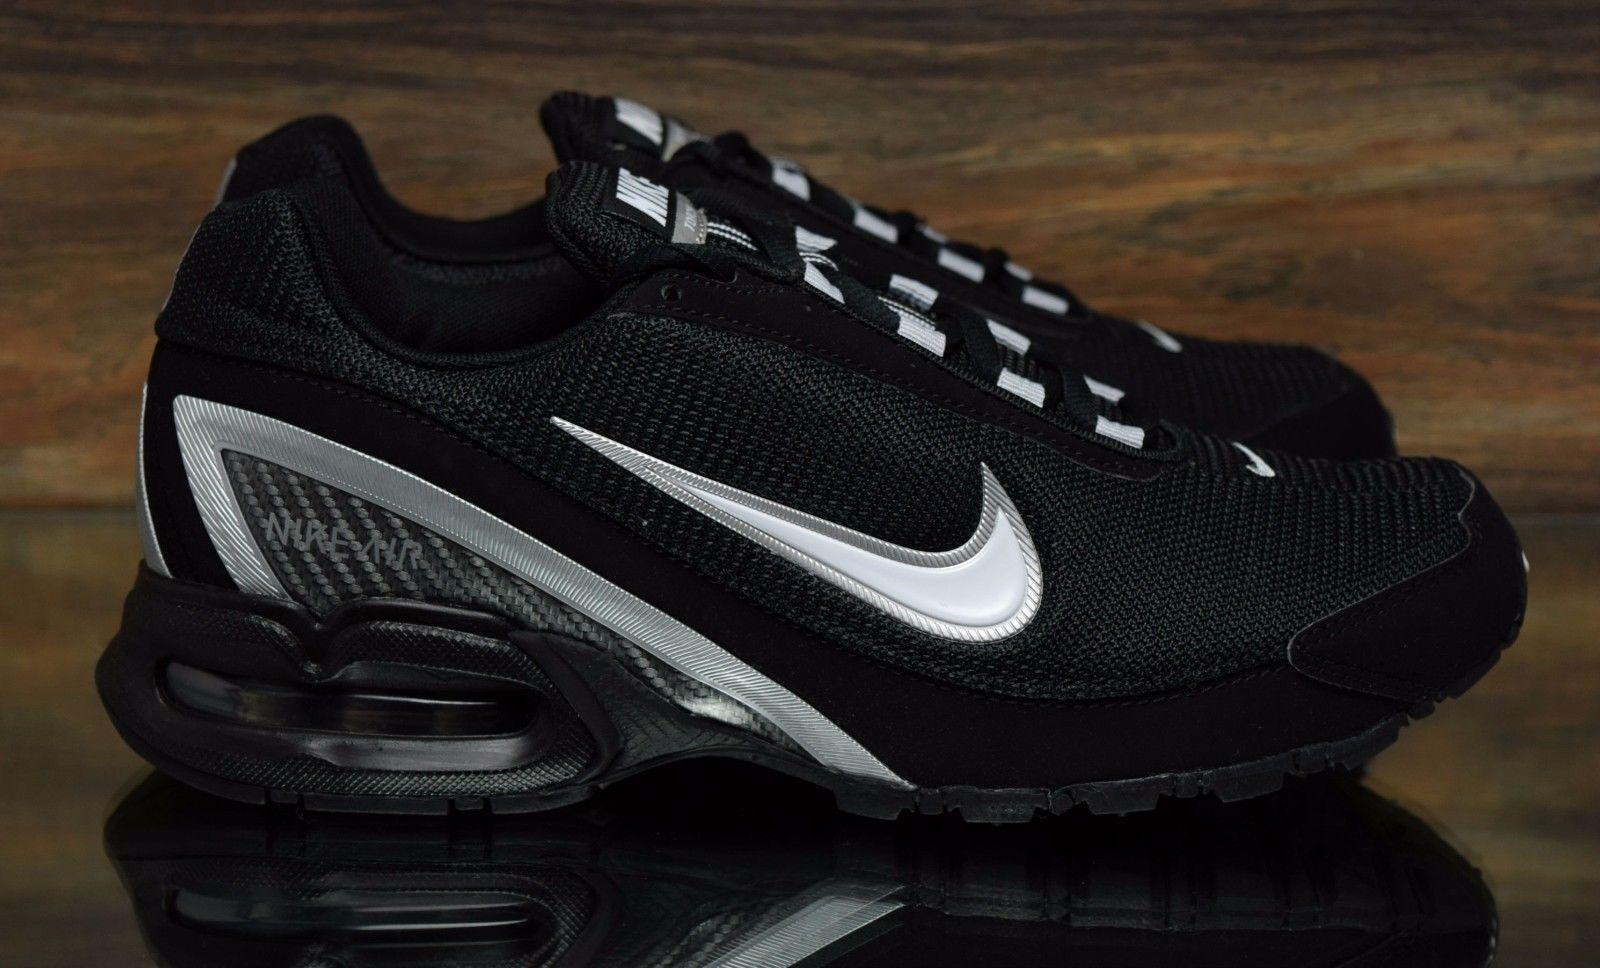 1a35cbc2a3010 Nike Air Max Torch 3 Black White 319116011 Running Shoes Mens Multi ...